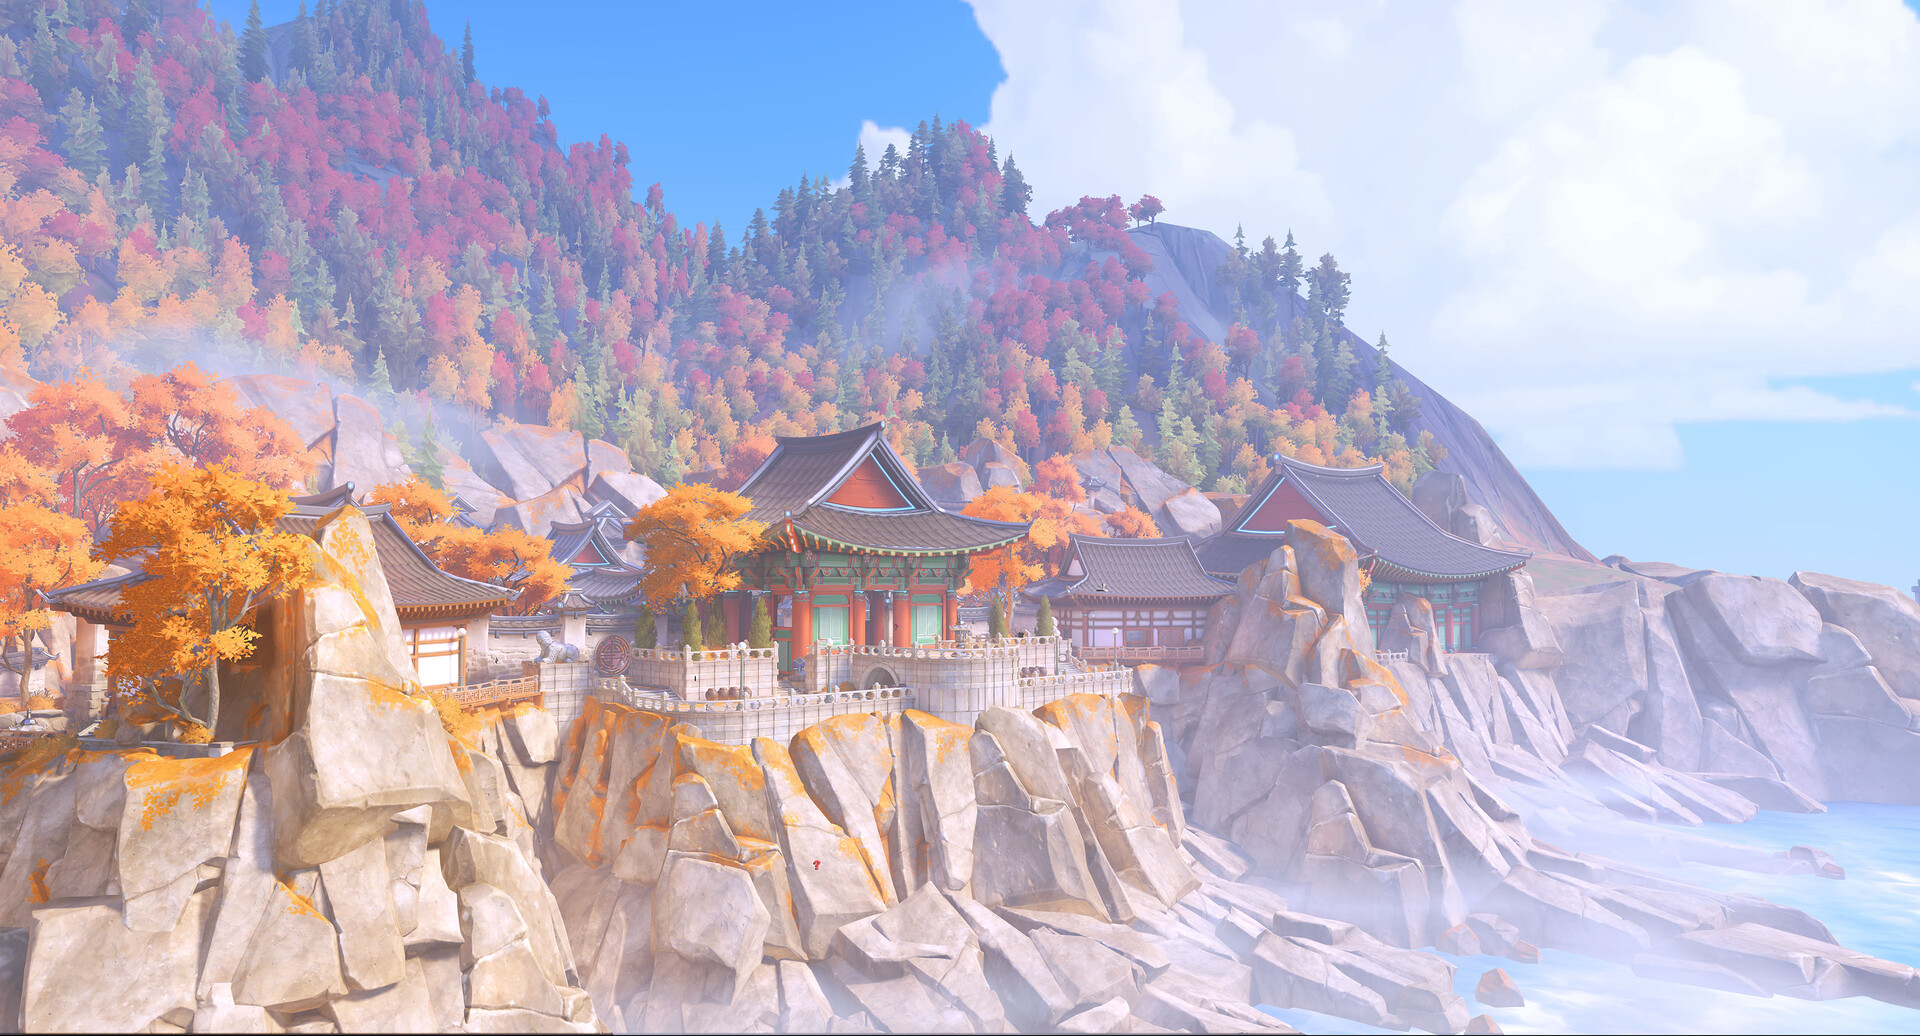 Helder pinto busan temple 05